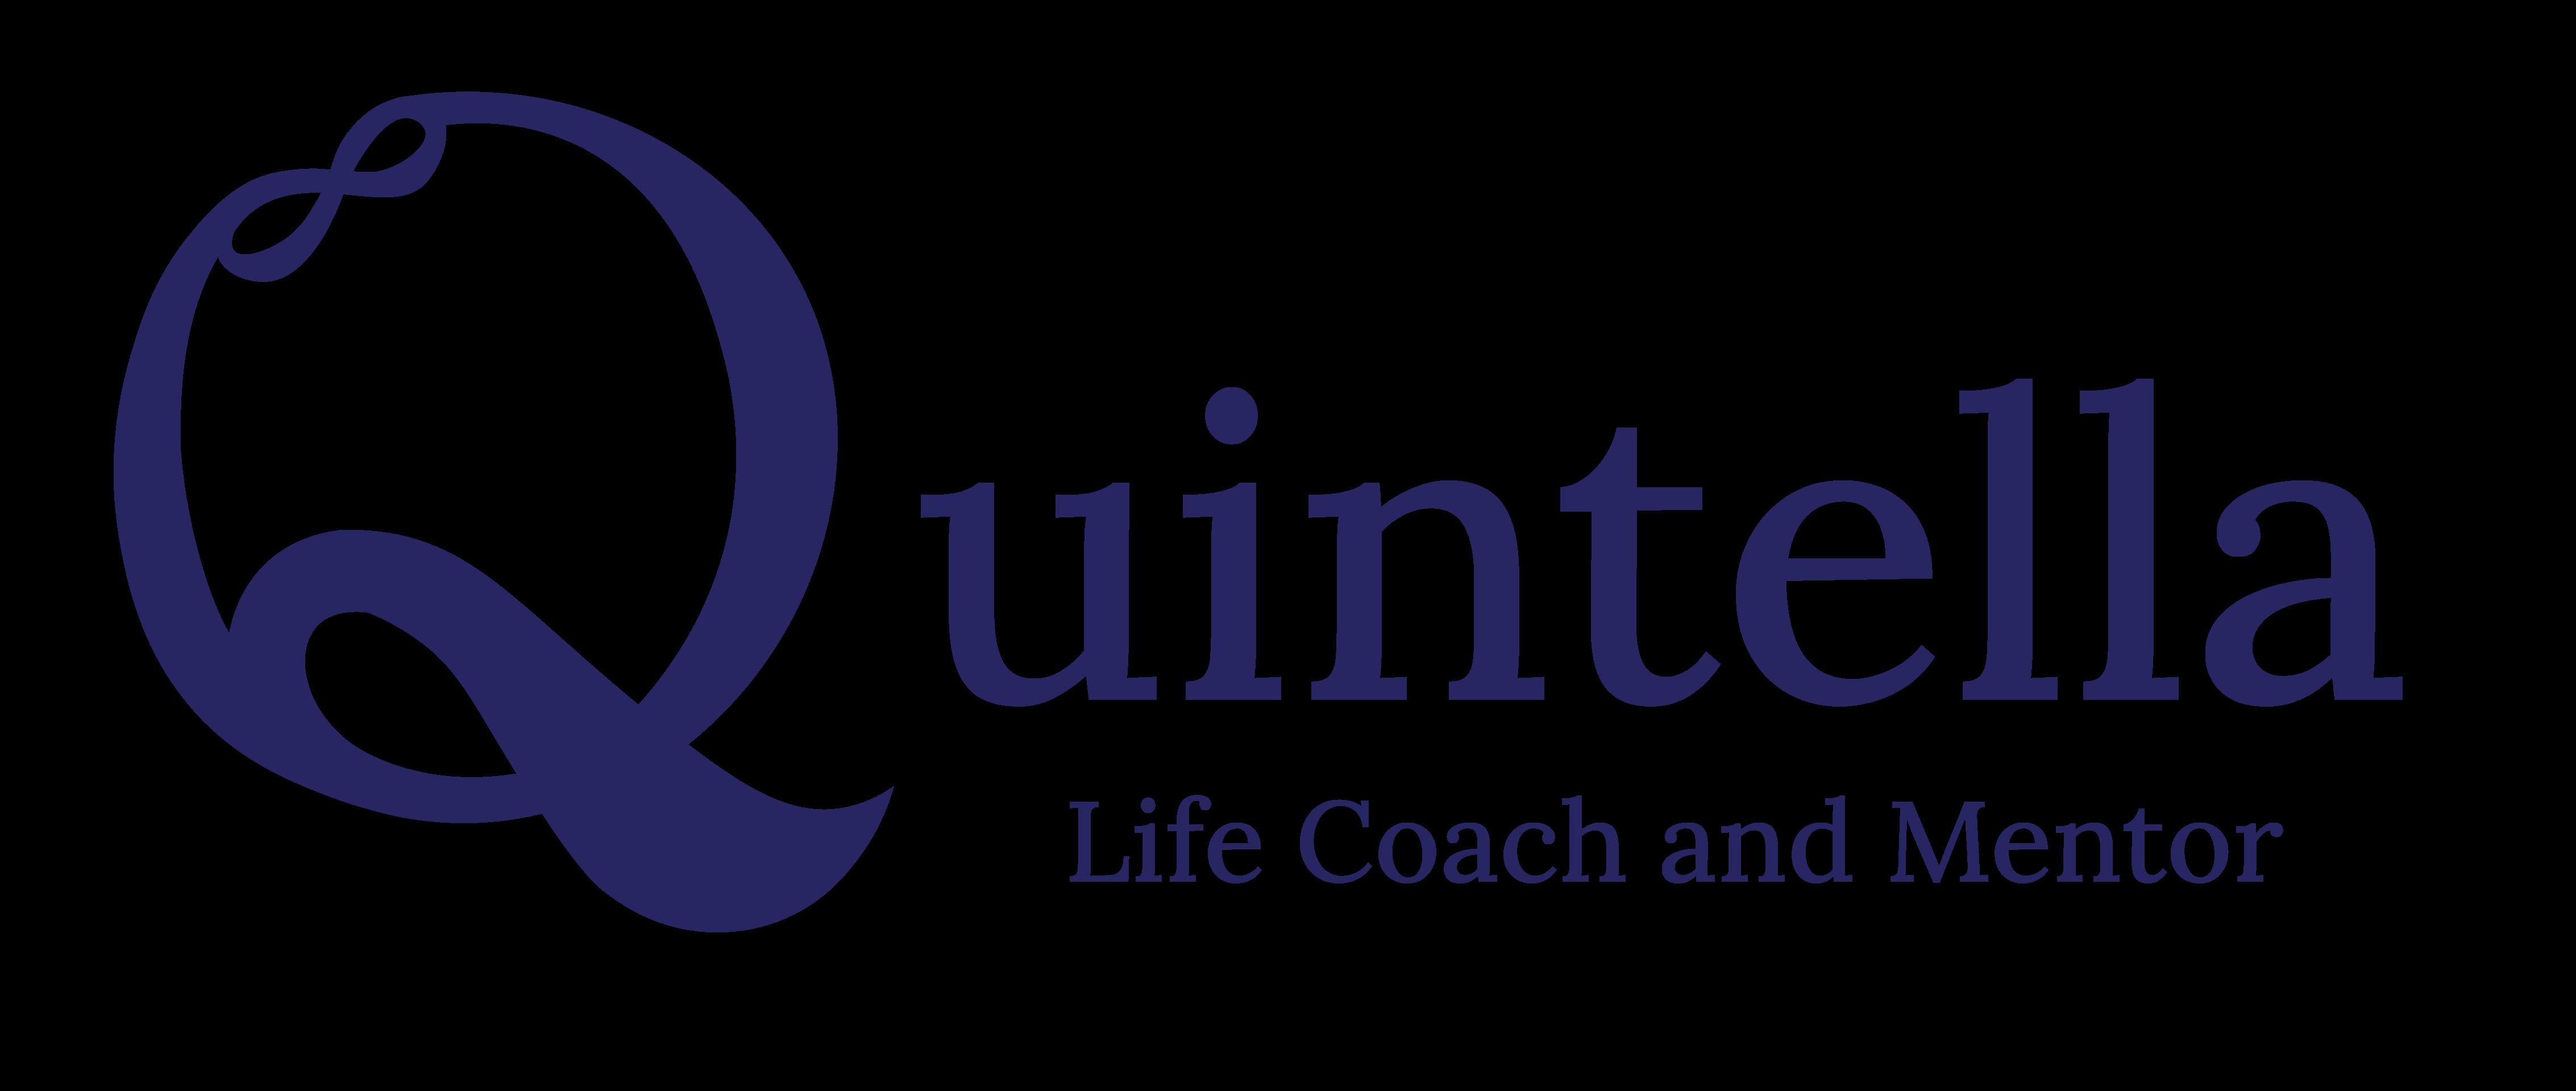 Quintella Life Coach and Mentor